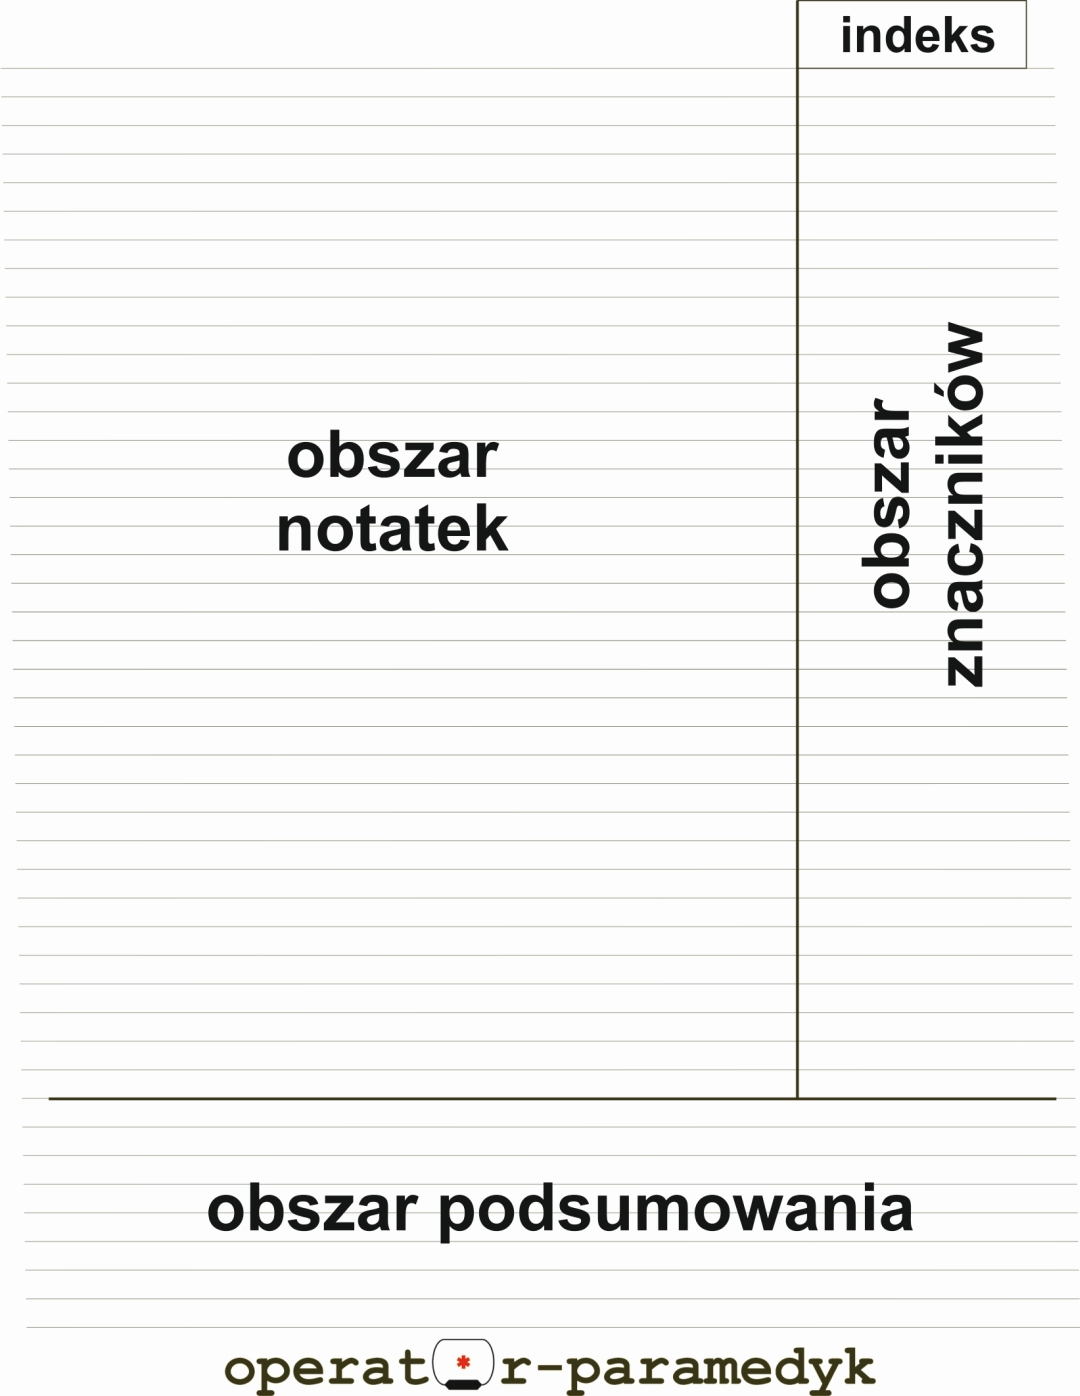 szablon notatek, CC-BY-NC, www.operator-paramedyk.pl